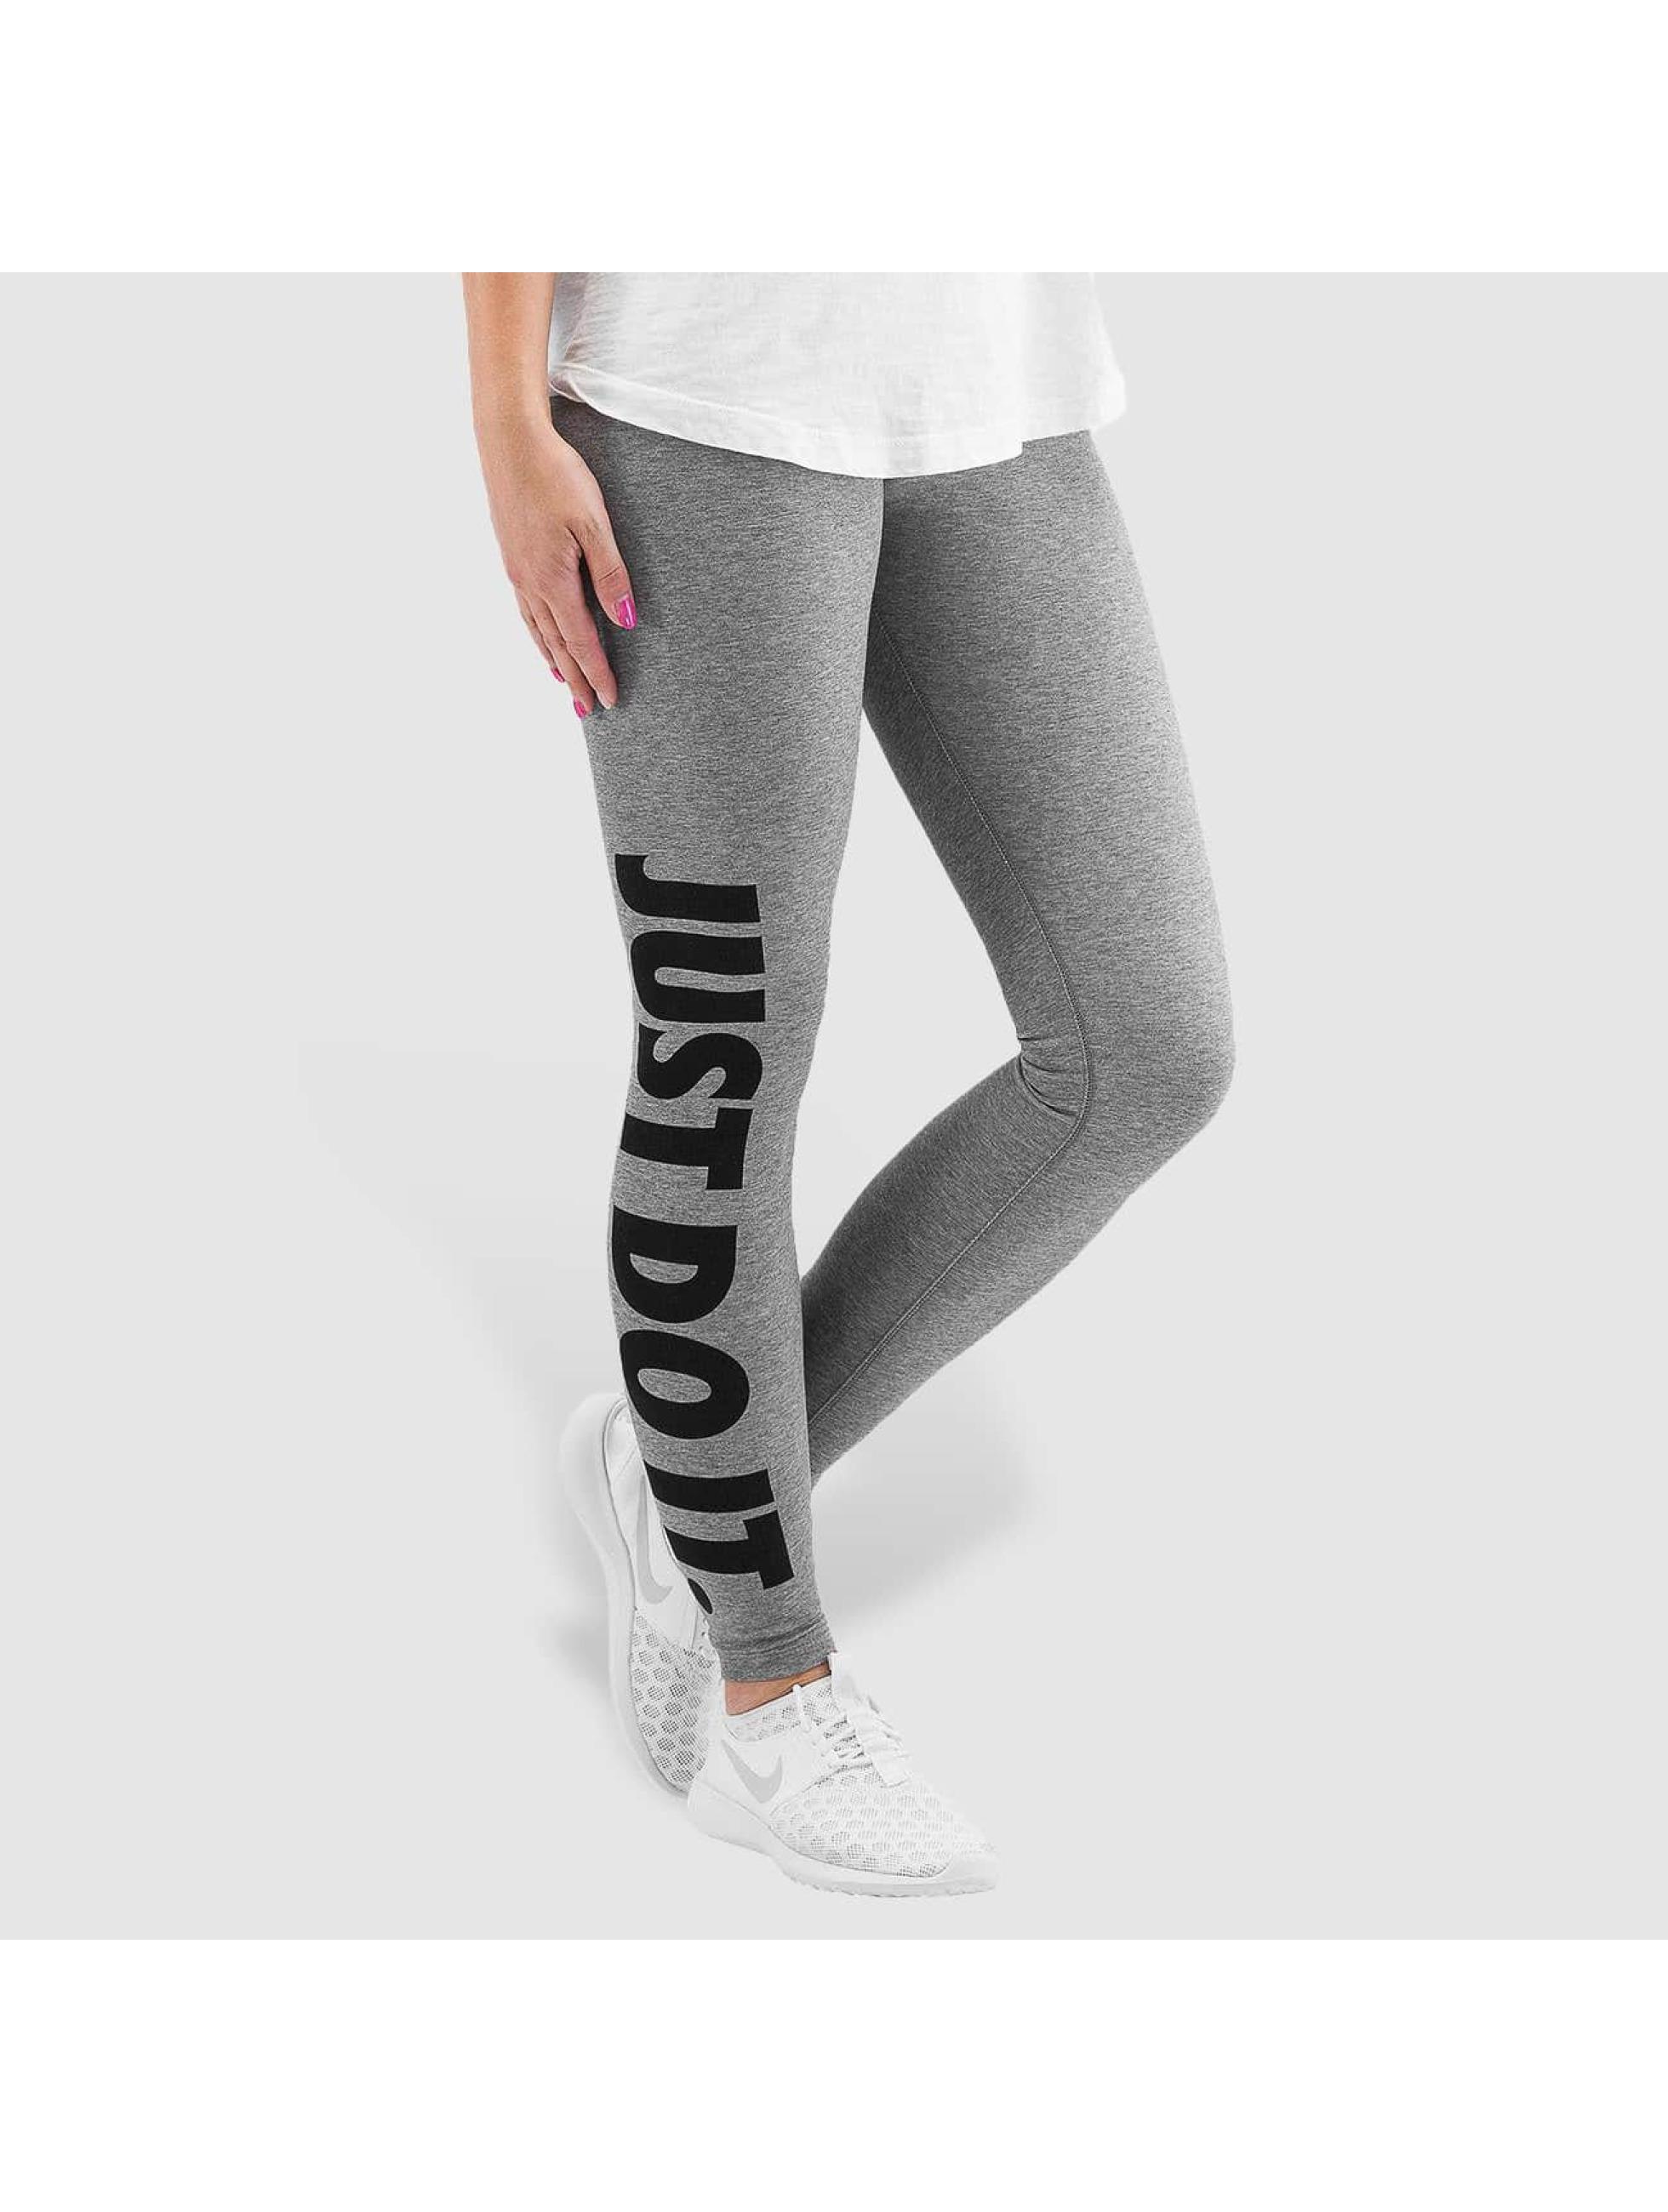 nike damen legging leg a see just do it in grau 239522. Black Bedroom Furniture Sets. Home Design Ideas